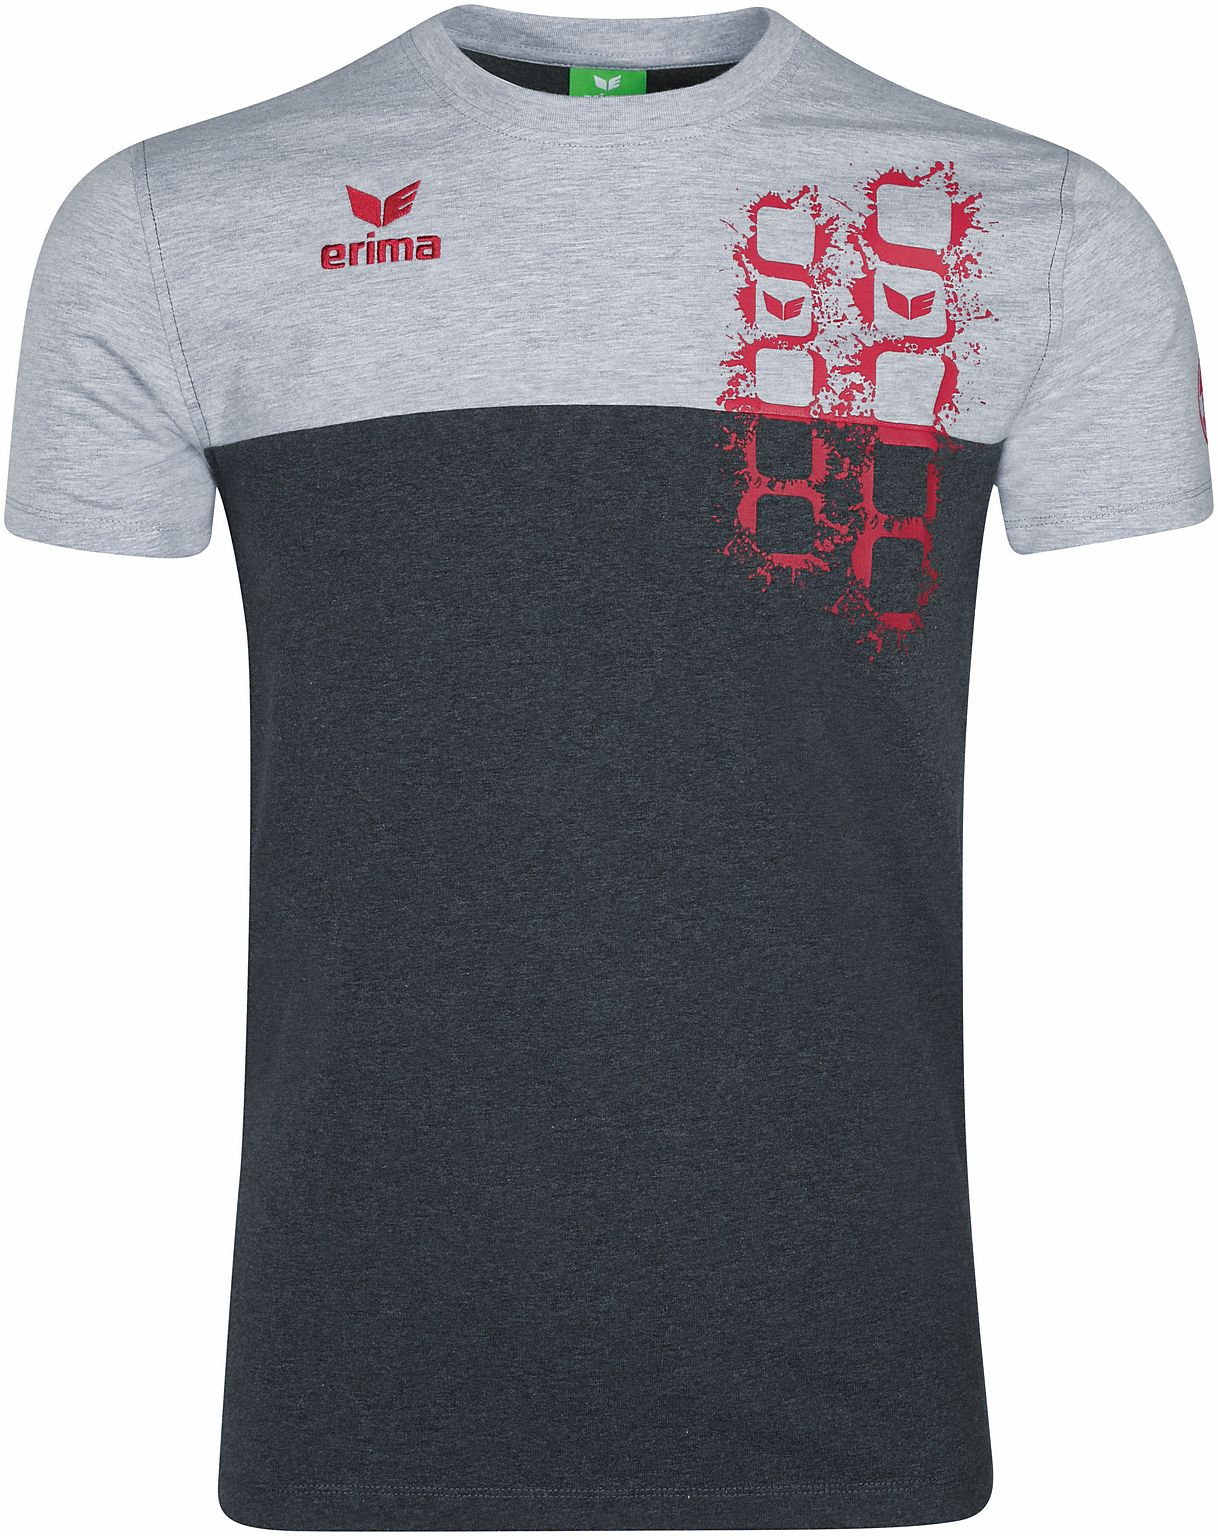 Erima 1.FC Köln – Kinder Graffic 5-C Shirt T-Shirt – 2080720